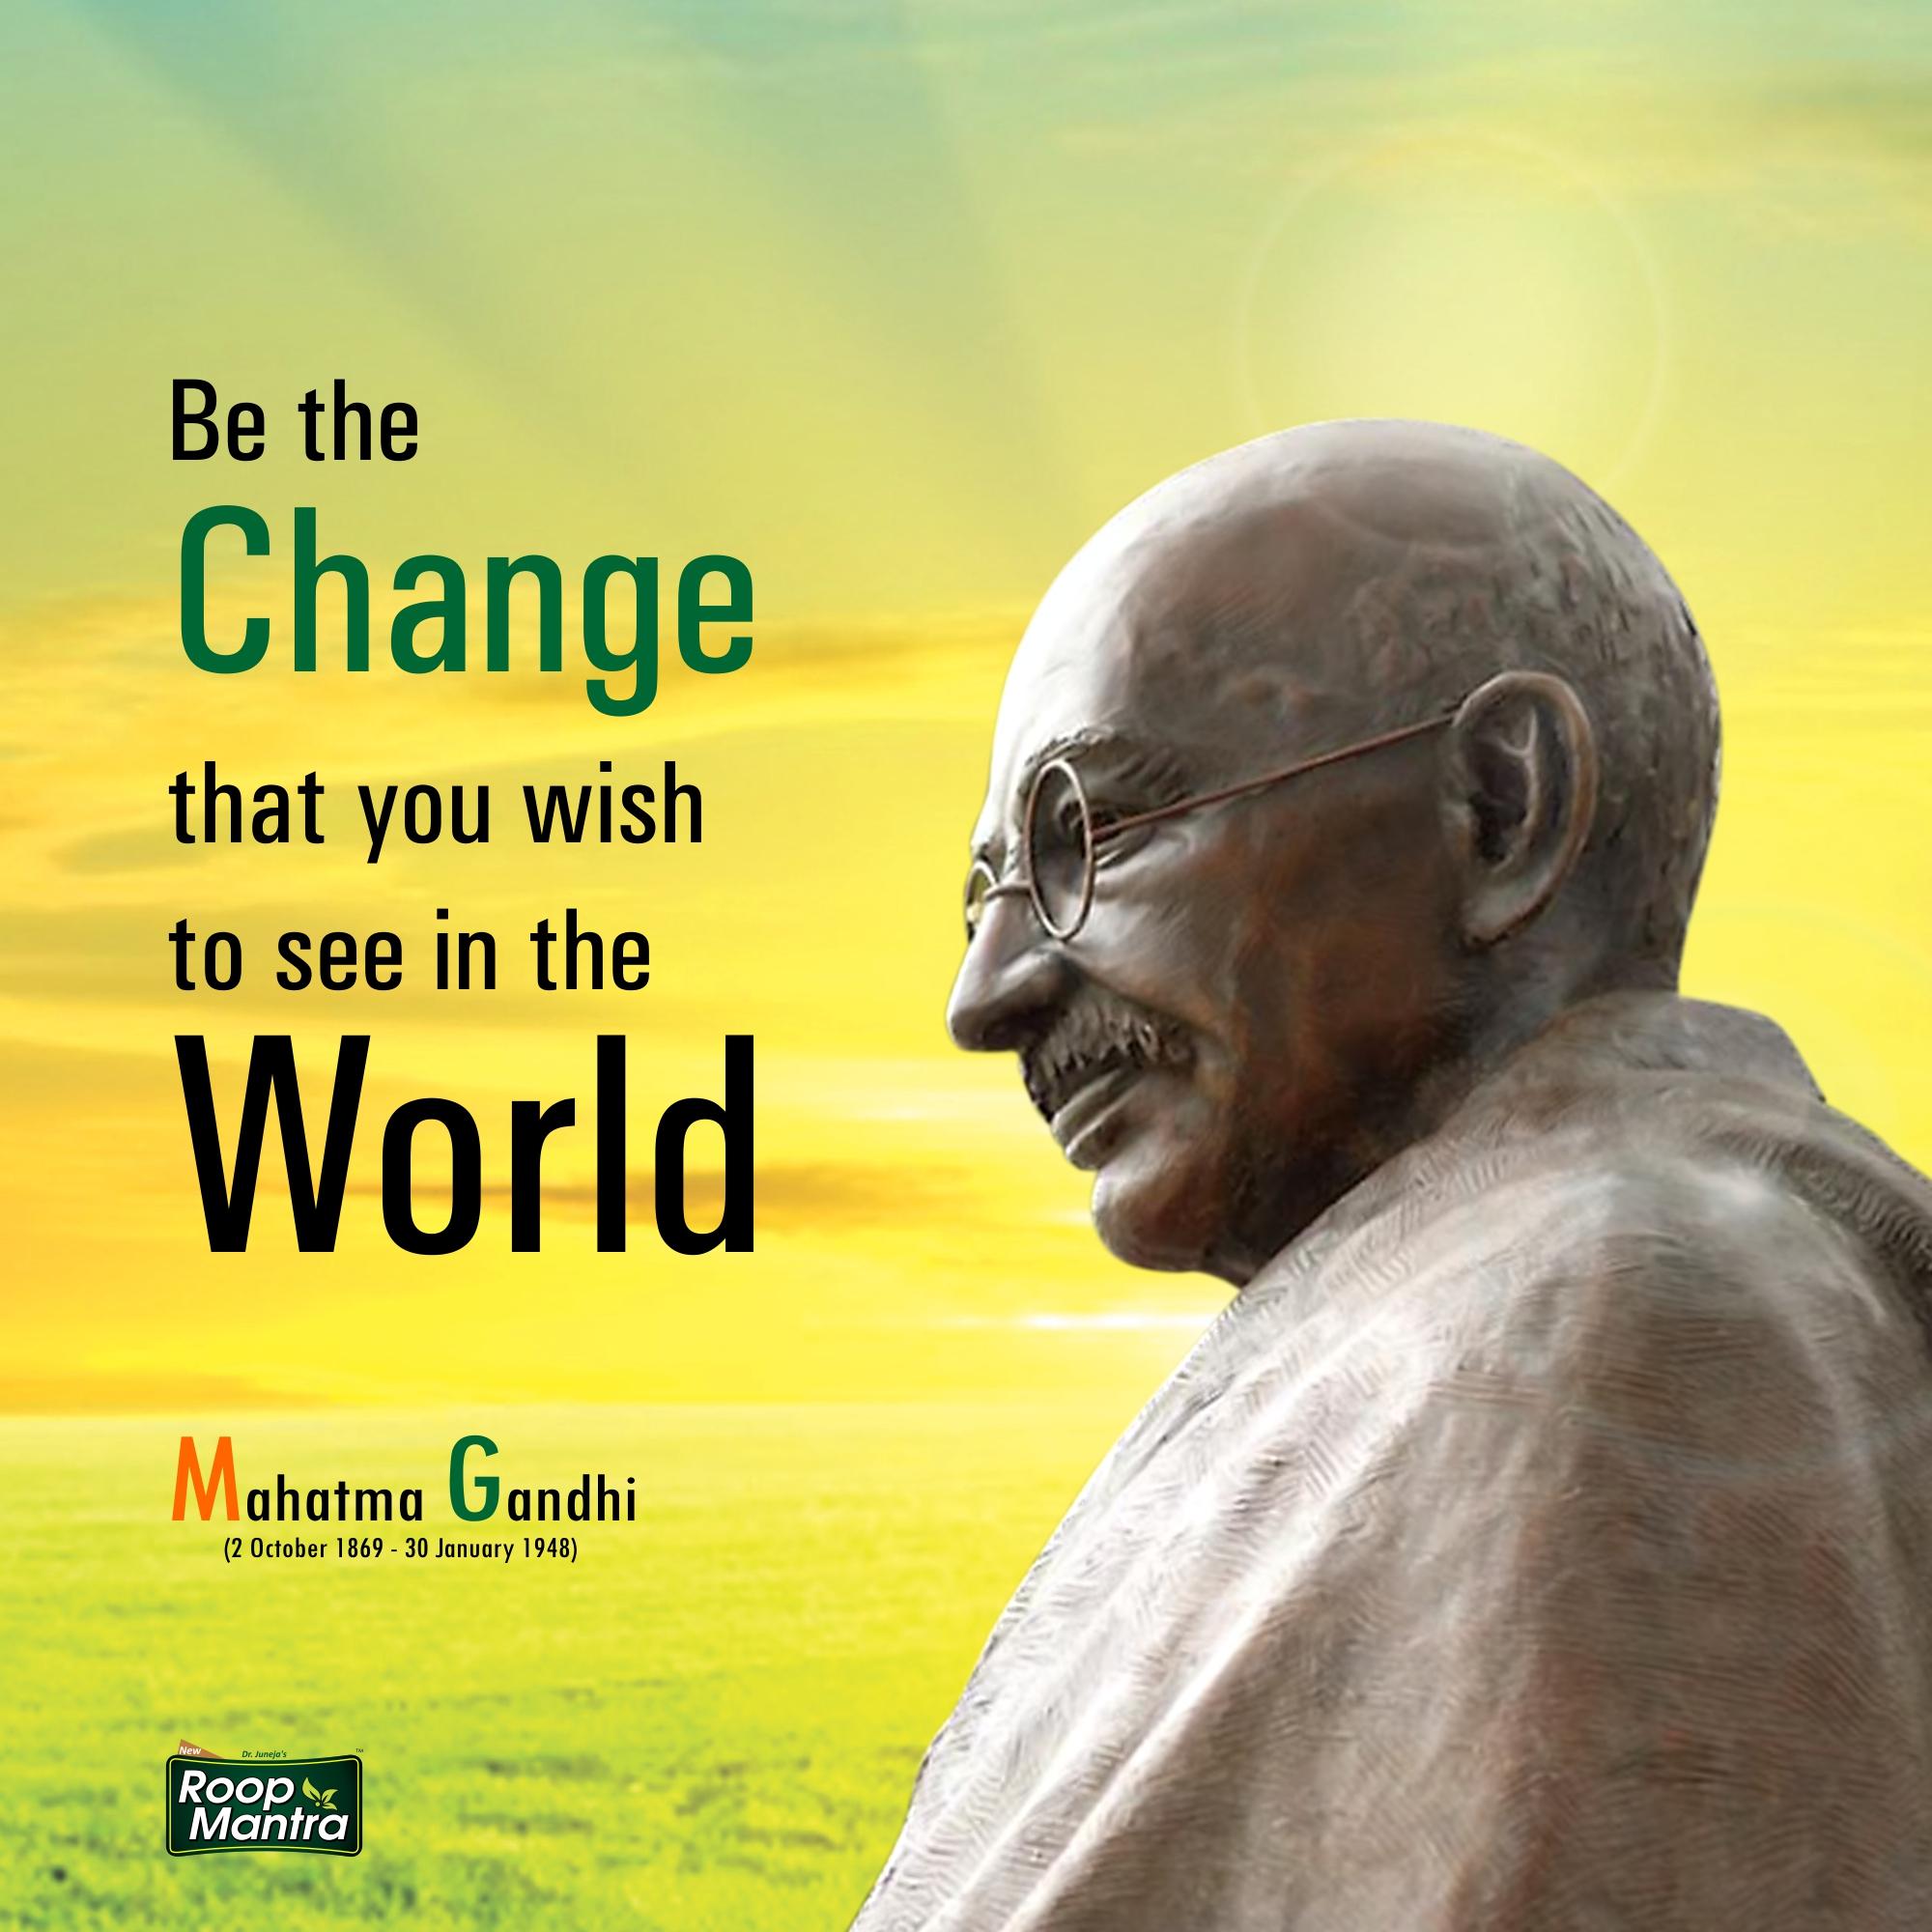 Mahatma Gandhi Jayanti In India-Monday, 2 October- Indian